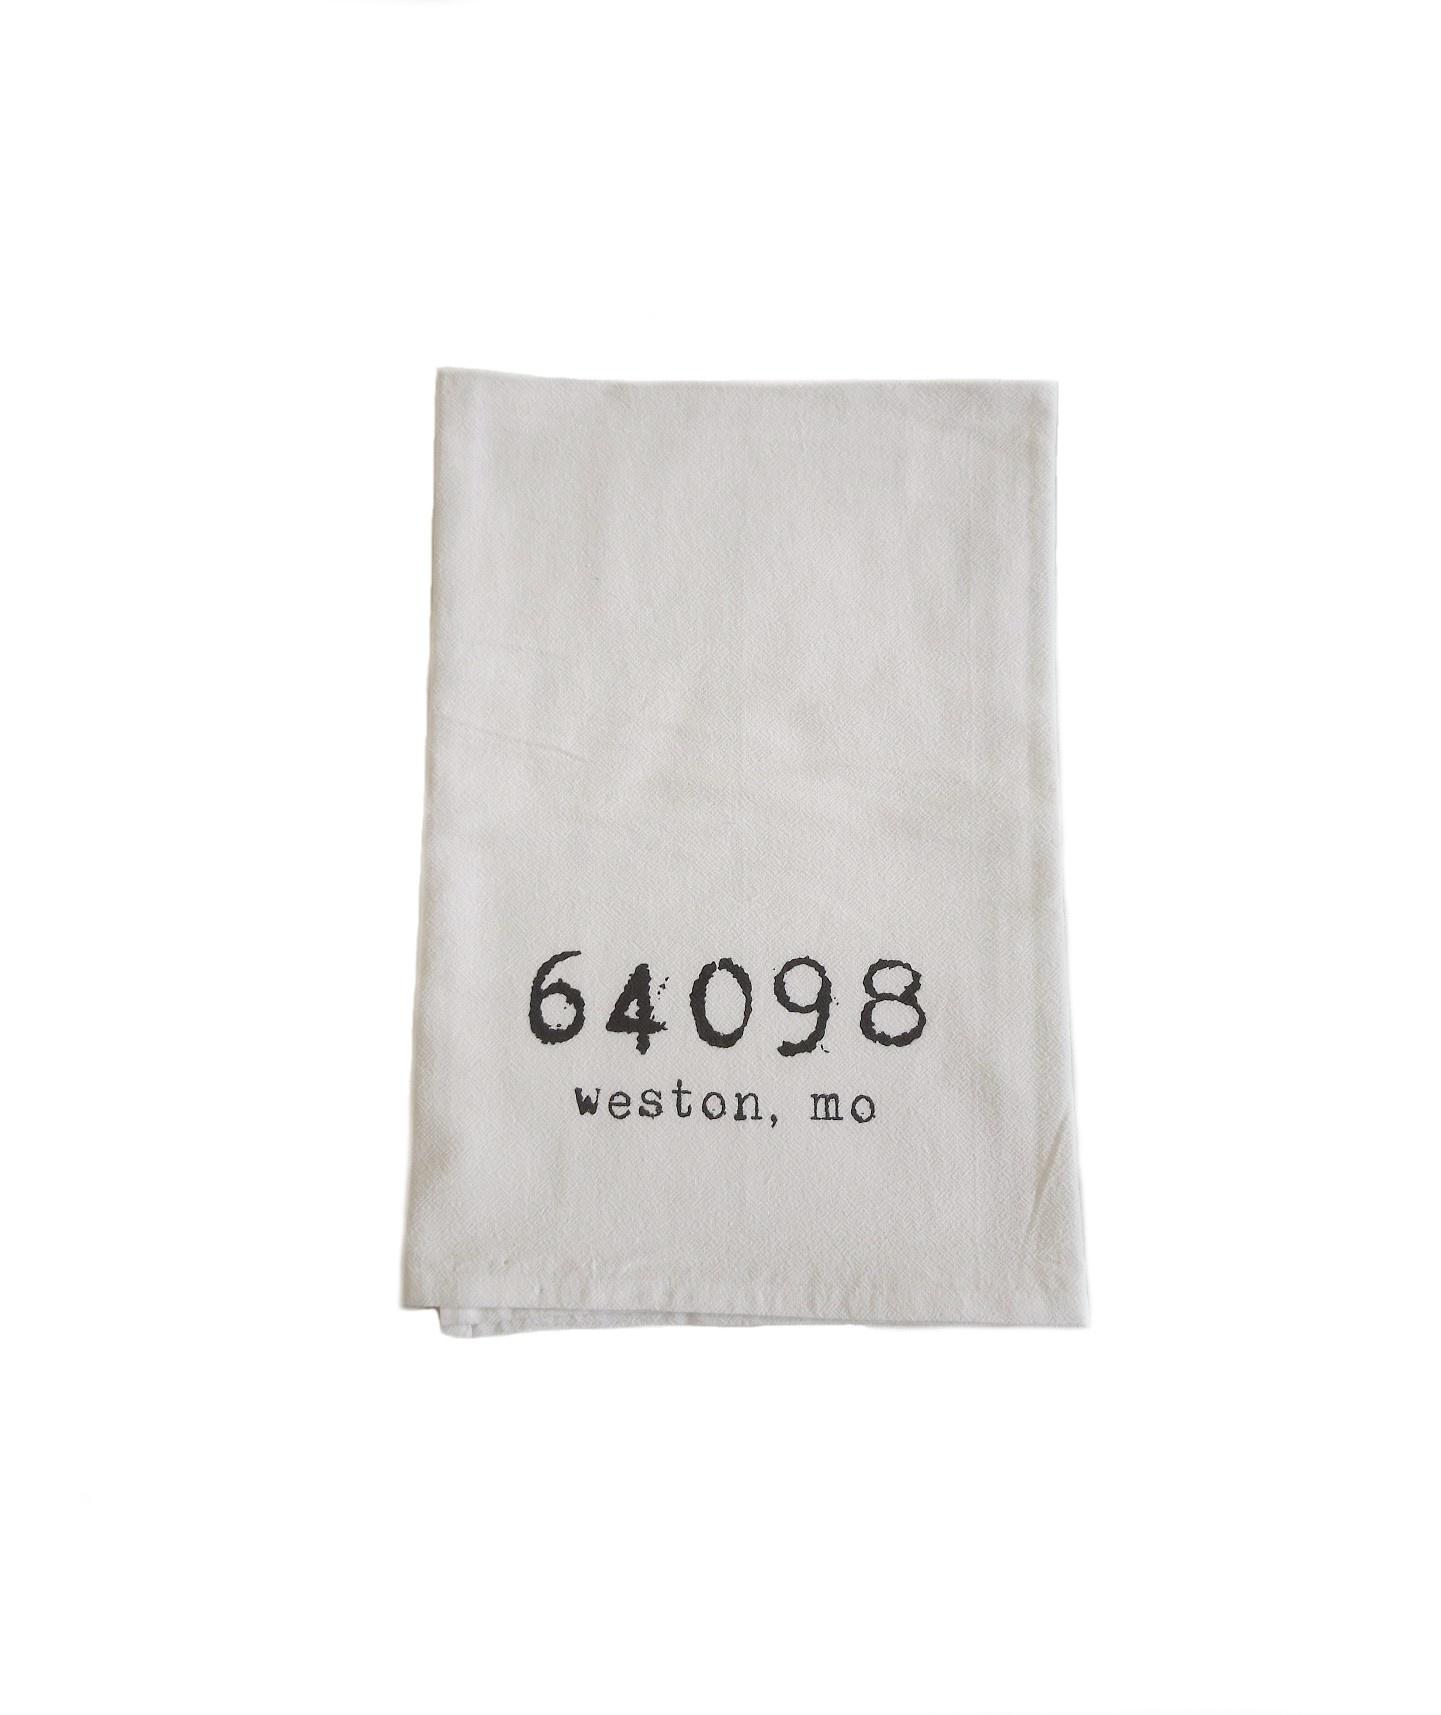 Weston, MO 64098 Tea Towel